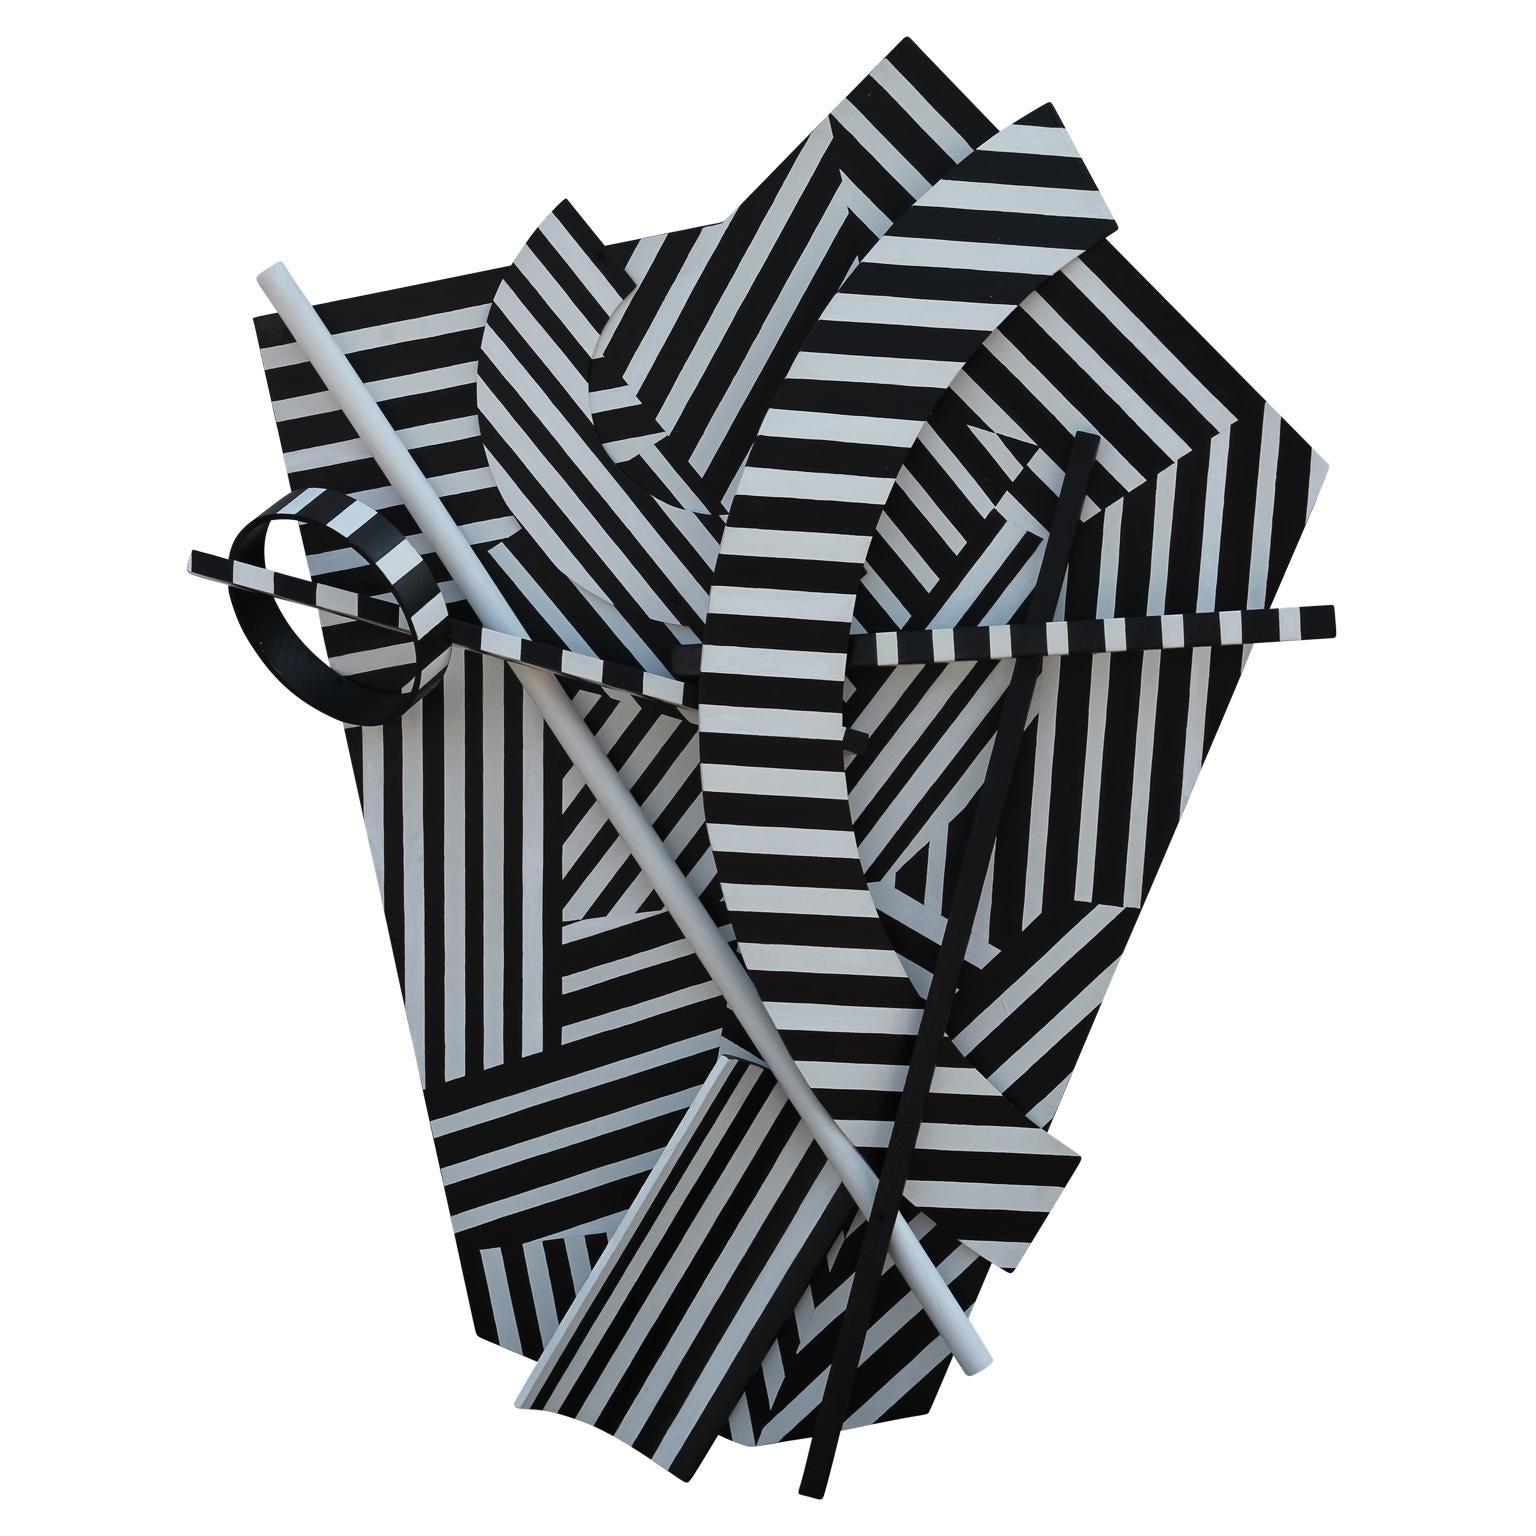 """Cut + Dried"" Stripped Asymmetrical Dimensional Painted Sculpture"